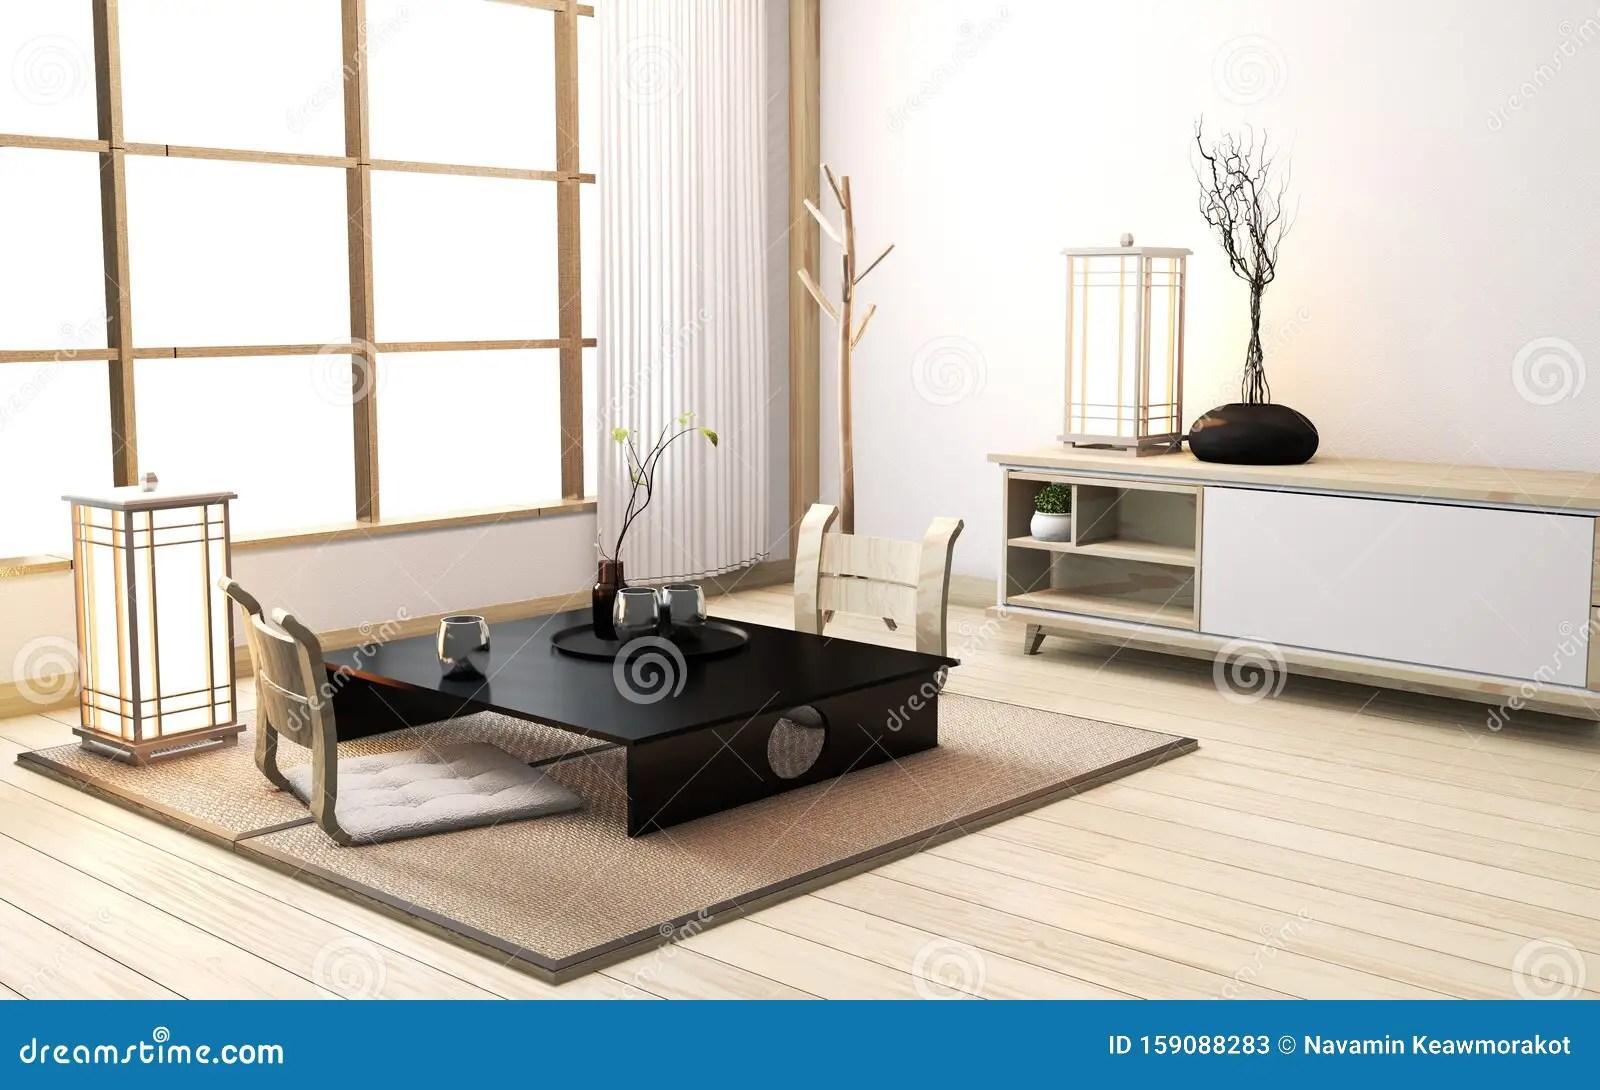 https www dreamstime com zen room interior low table pillow tatami mat wooden room japanese style d rendering mock up zen room interior image159088283